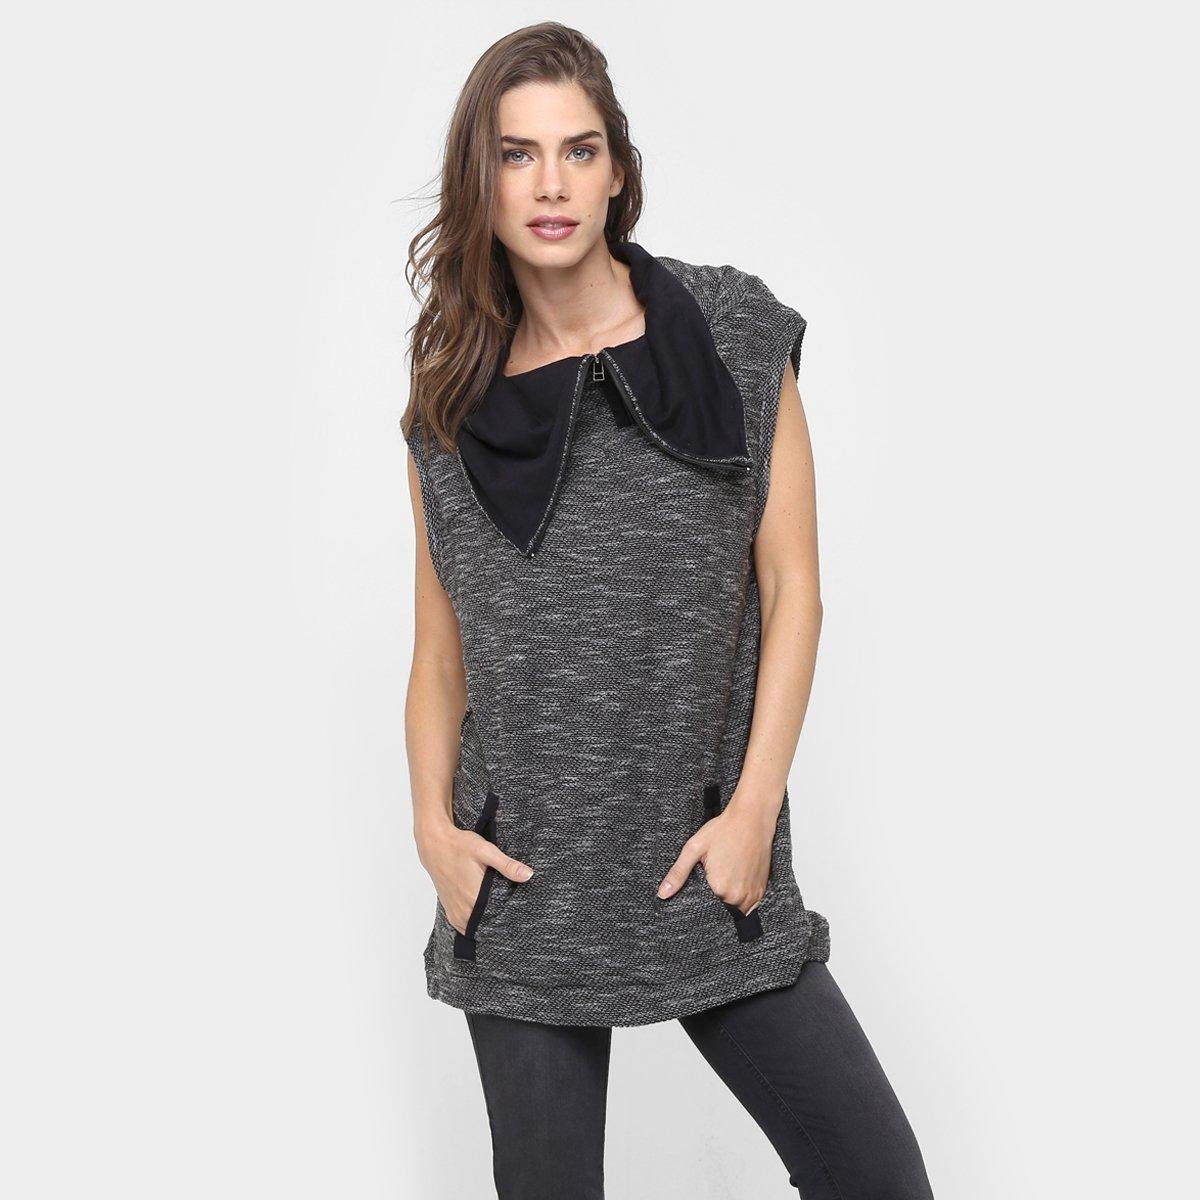 43d017d8f48a5 Camiseta MCD Especial Paul - Compre Agora